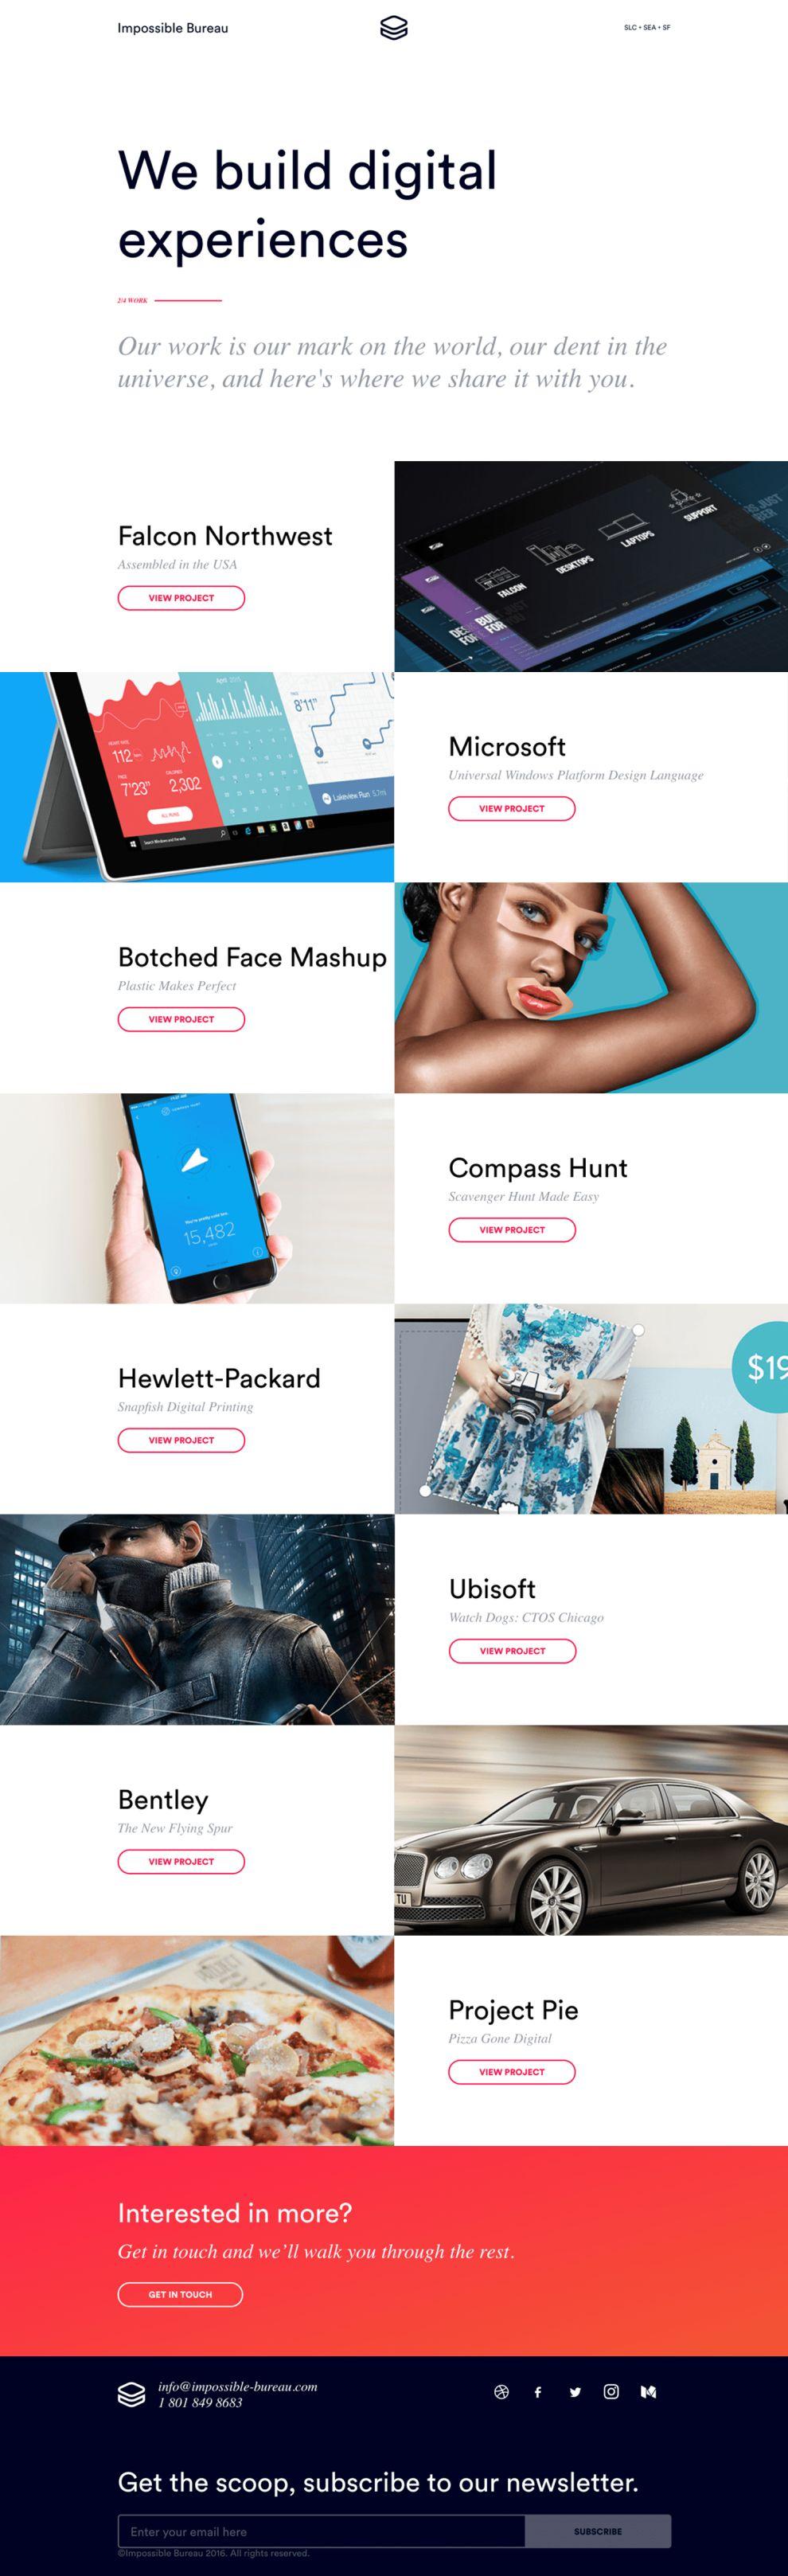 Impossible Bureau Beautiful Product Page